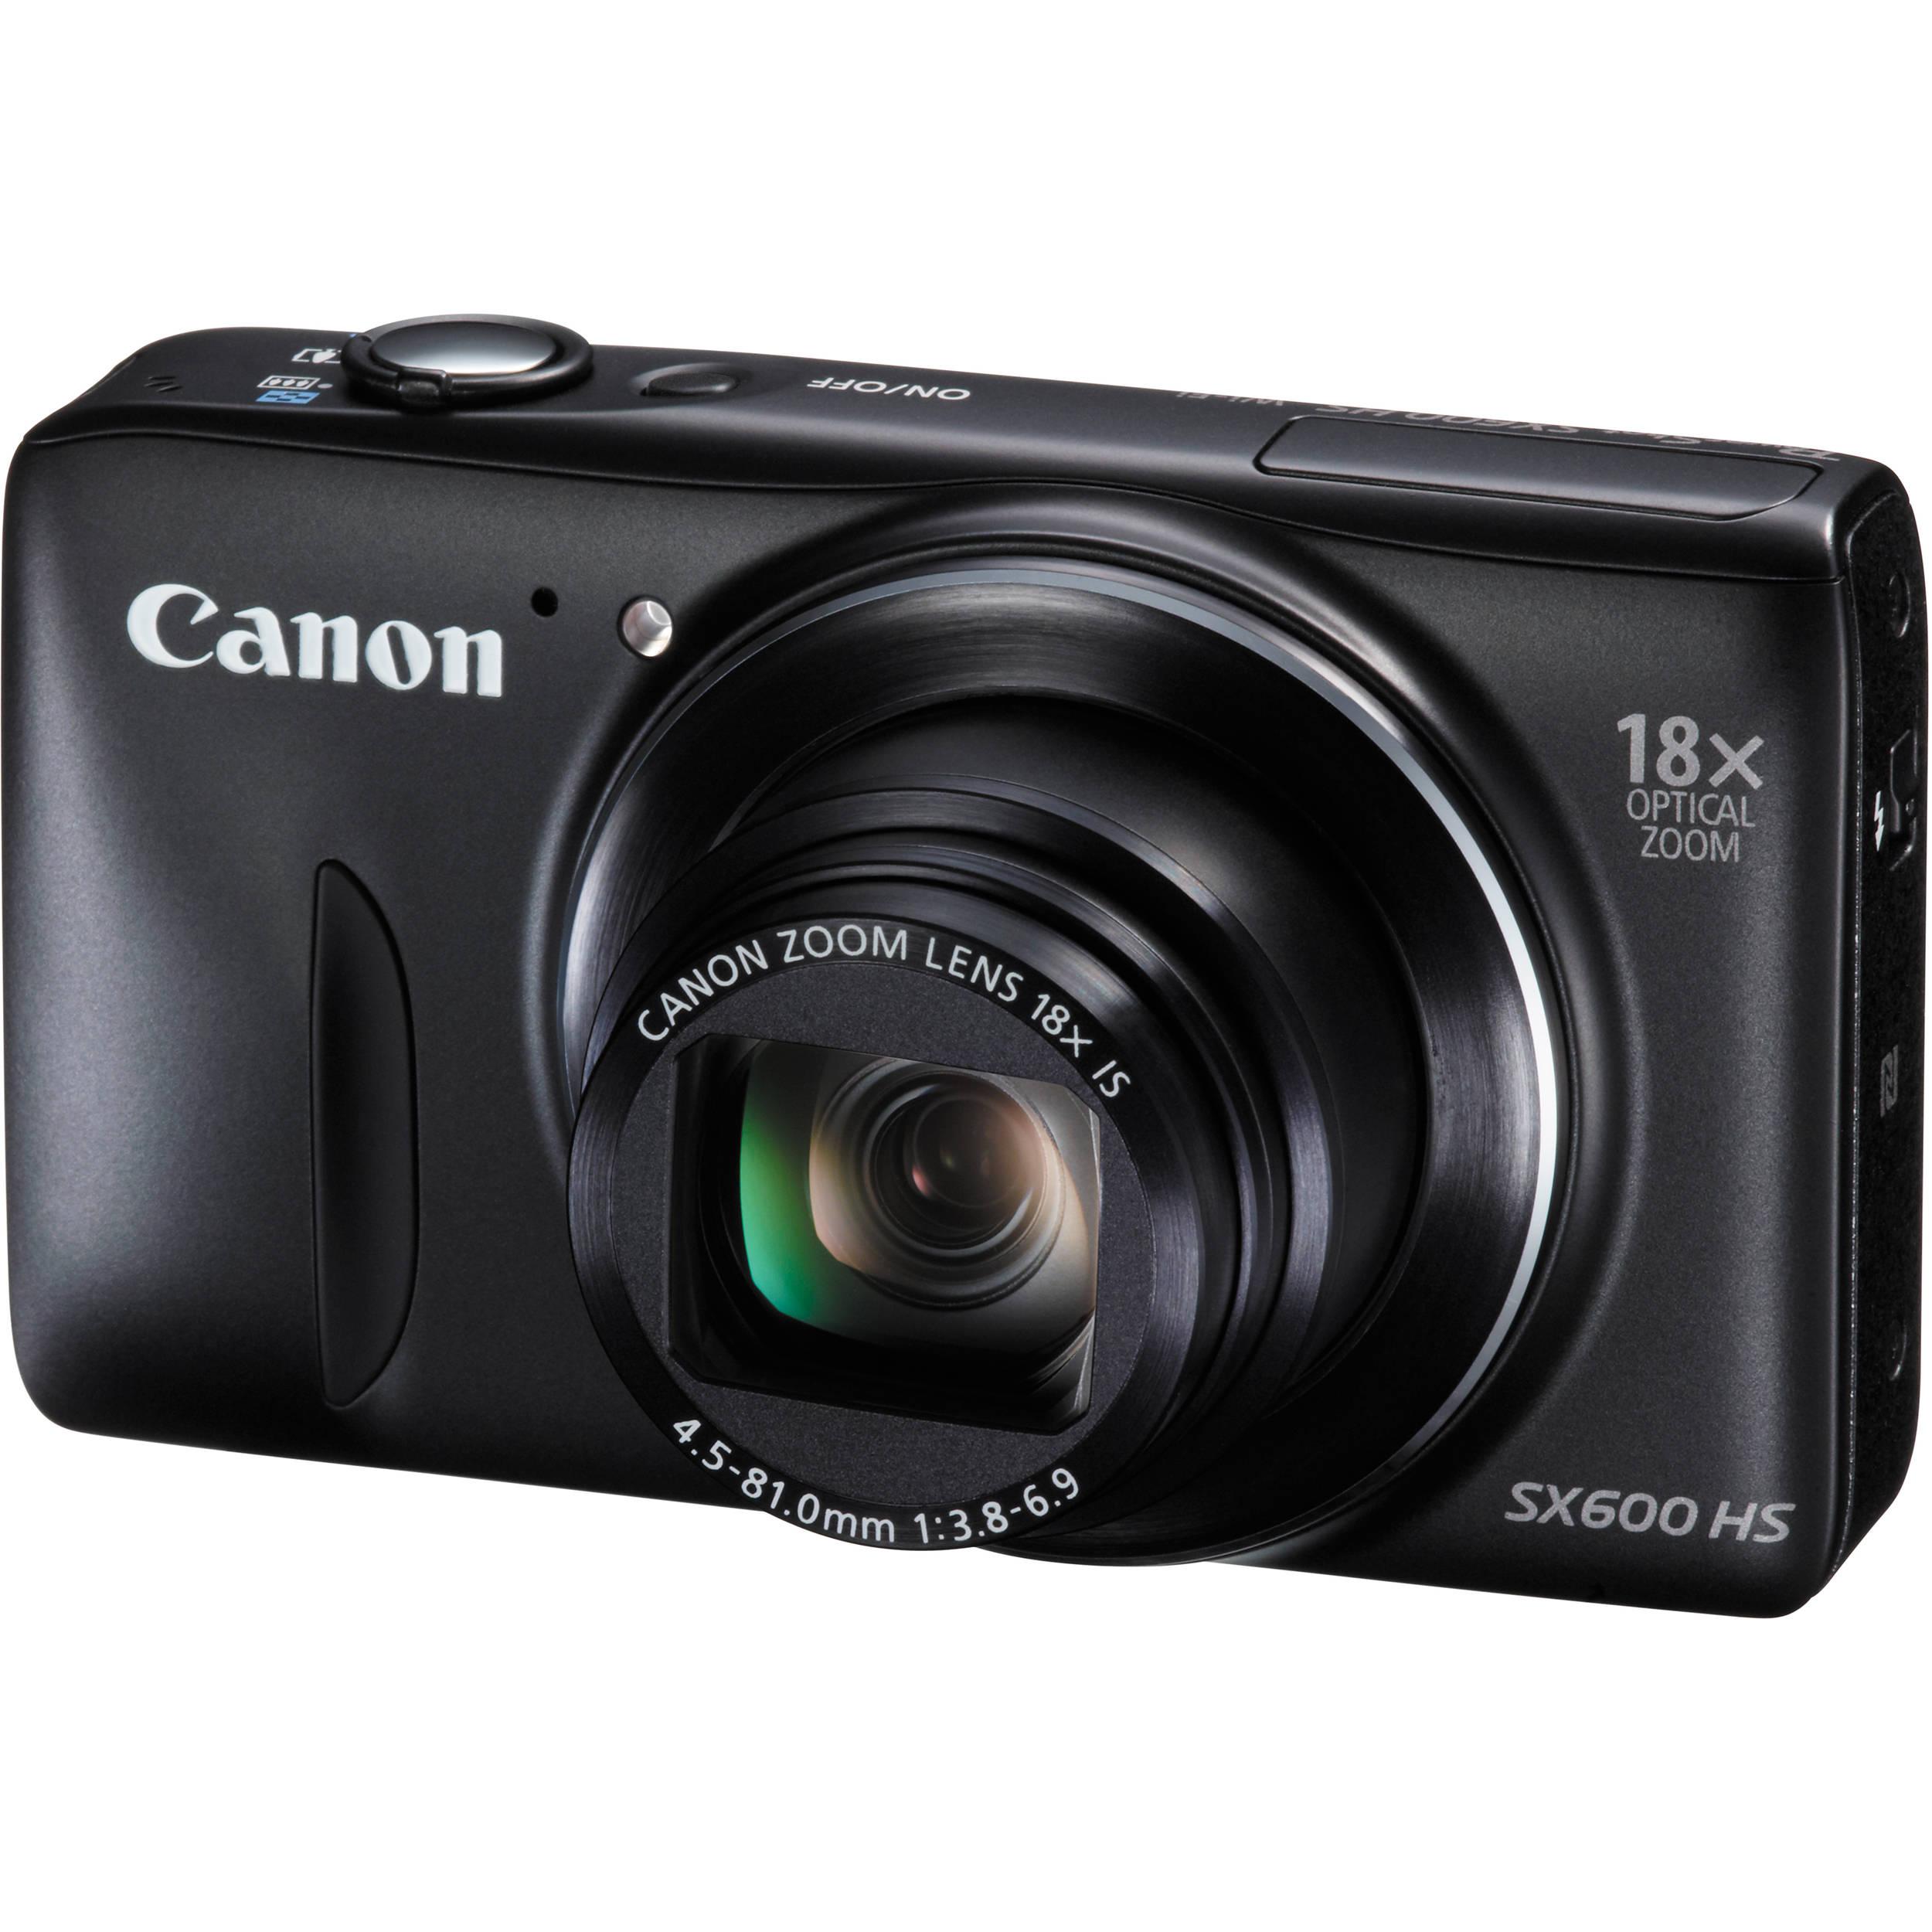 Canon PowerShot SX600 HS 16MP WiFi Digital Camera Price in Bangladesh